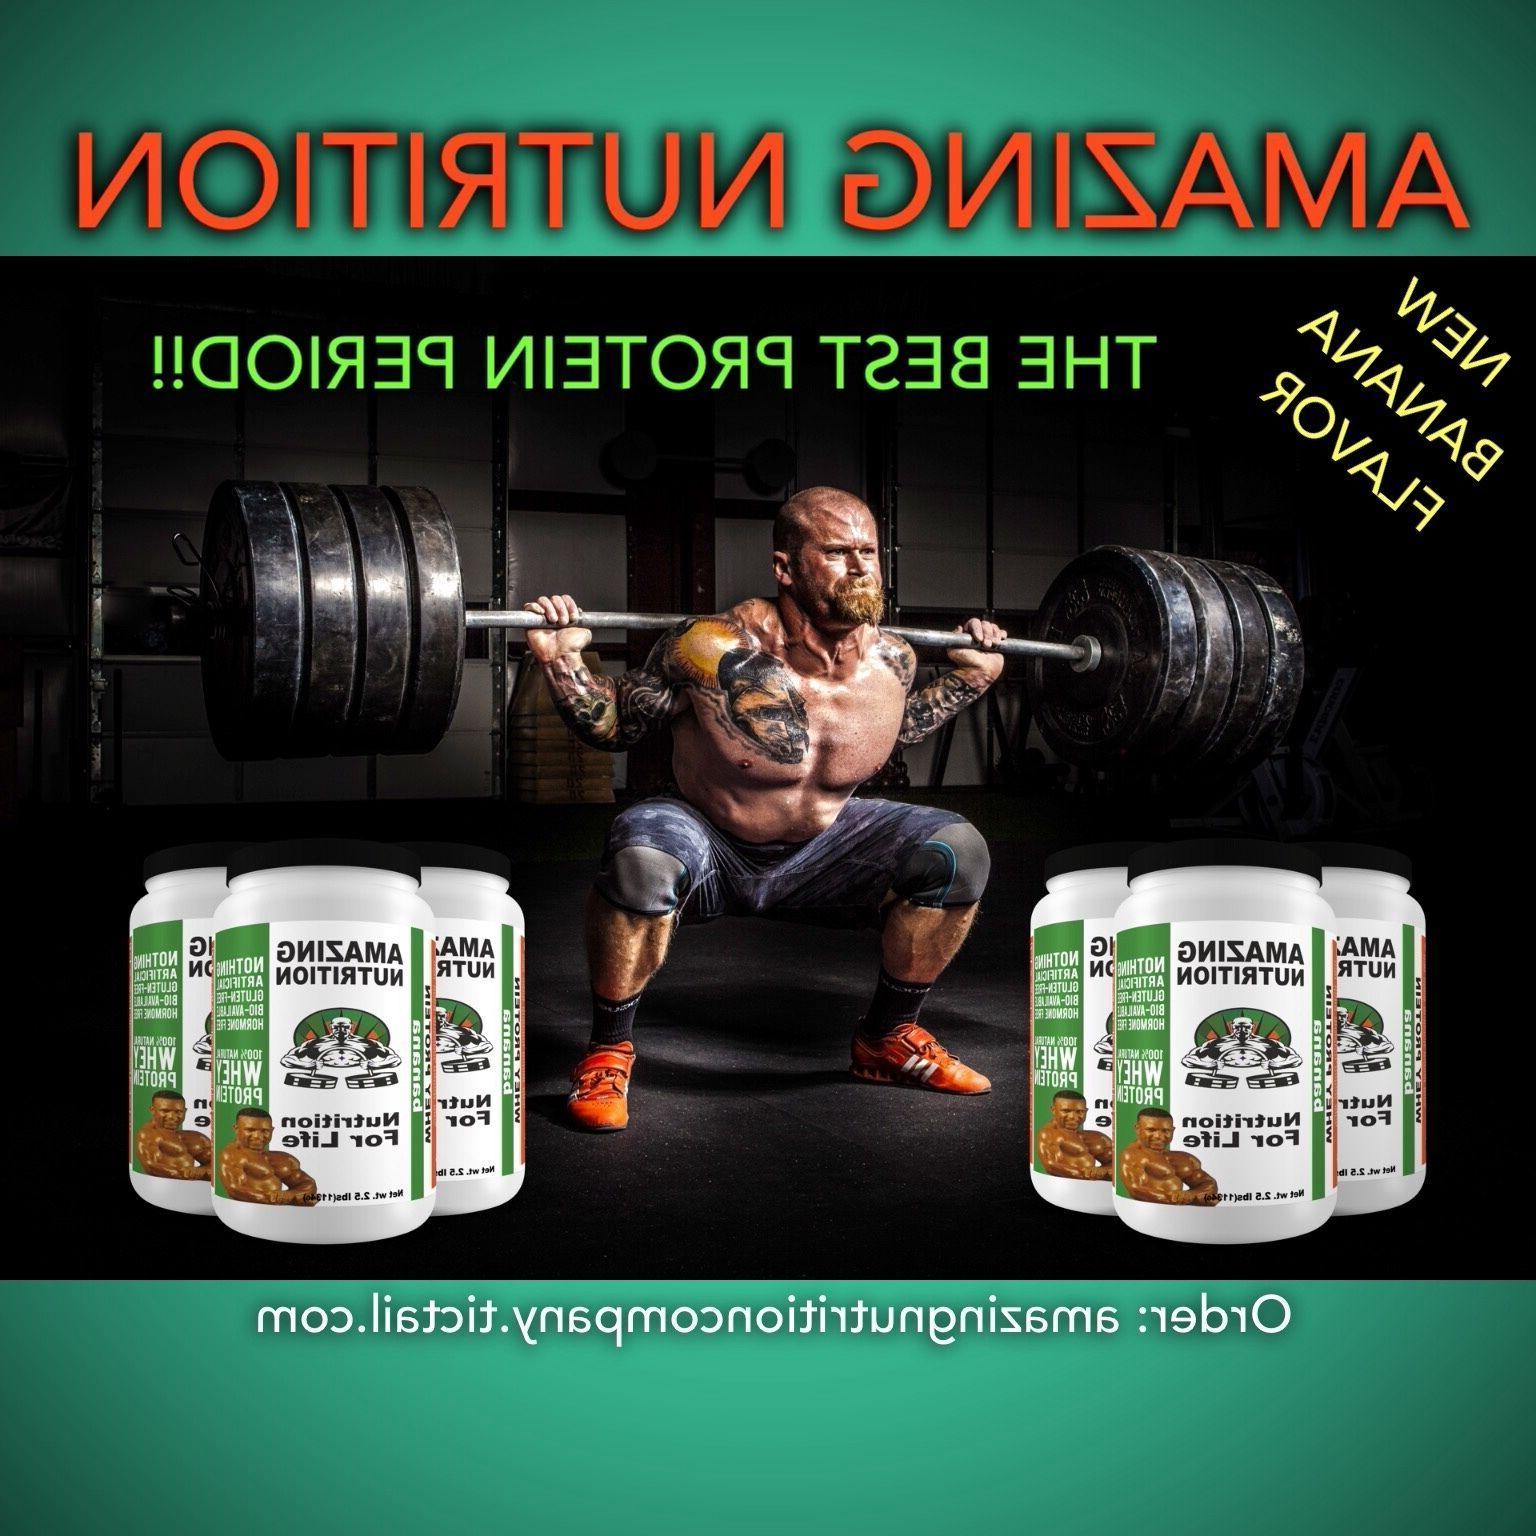 100% Whey Protein Sweetened Stevia.